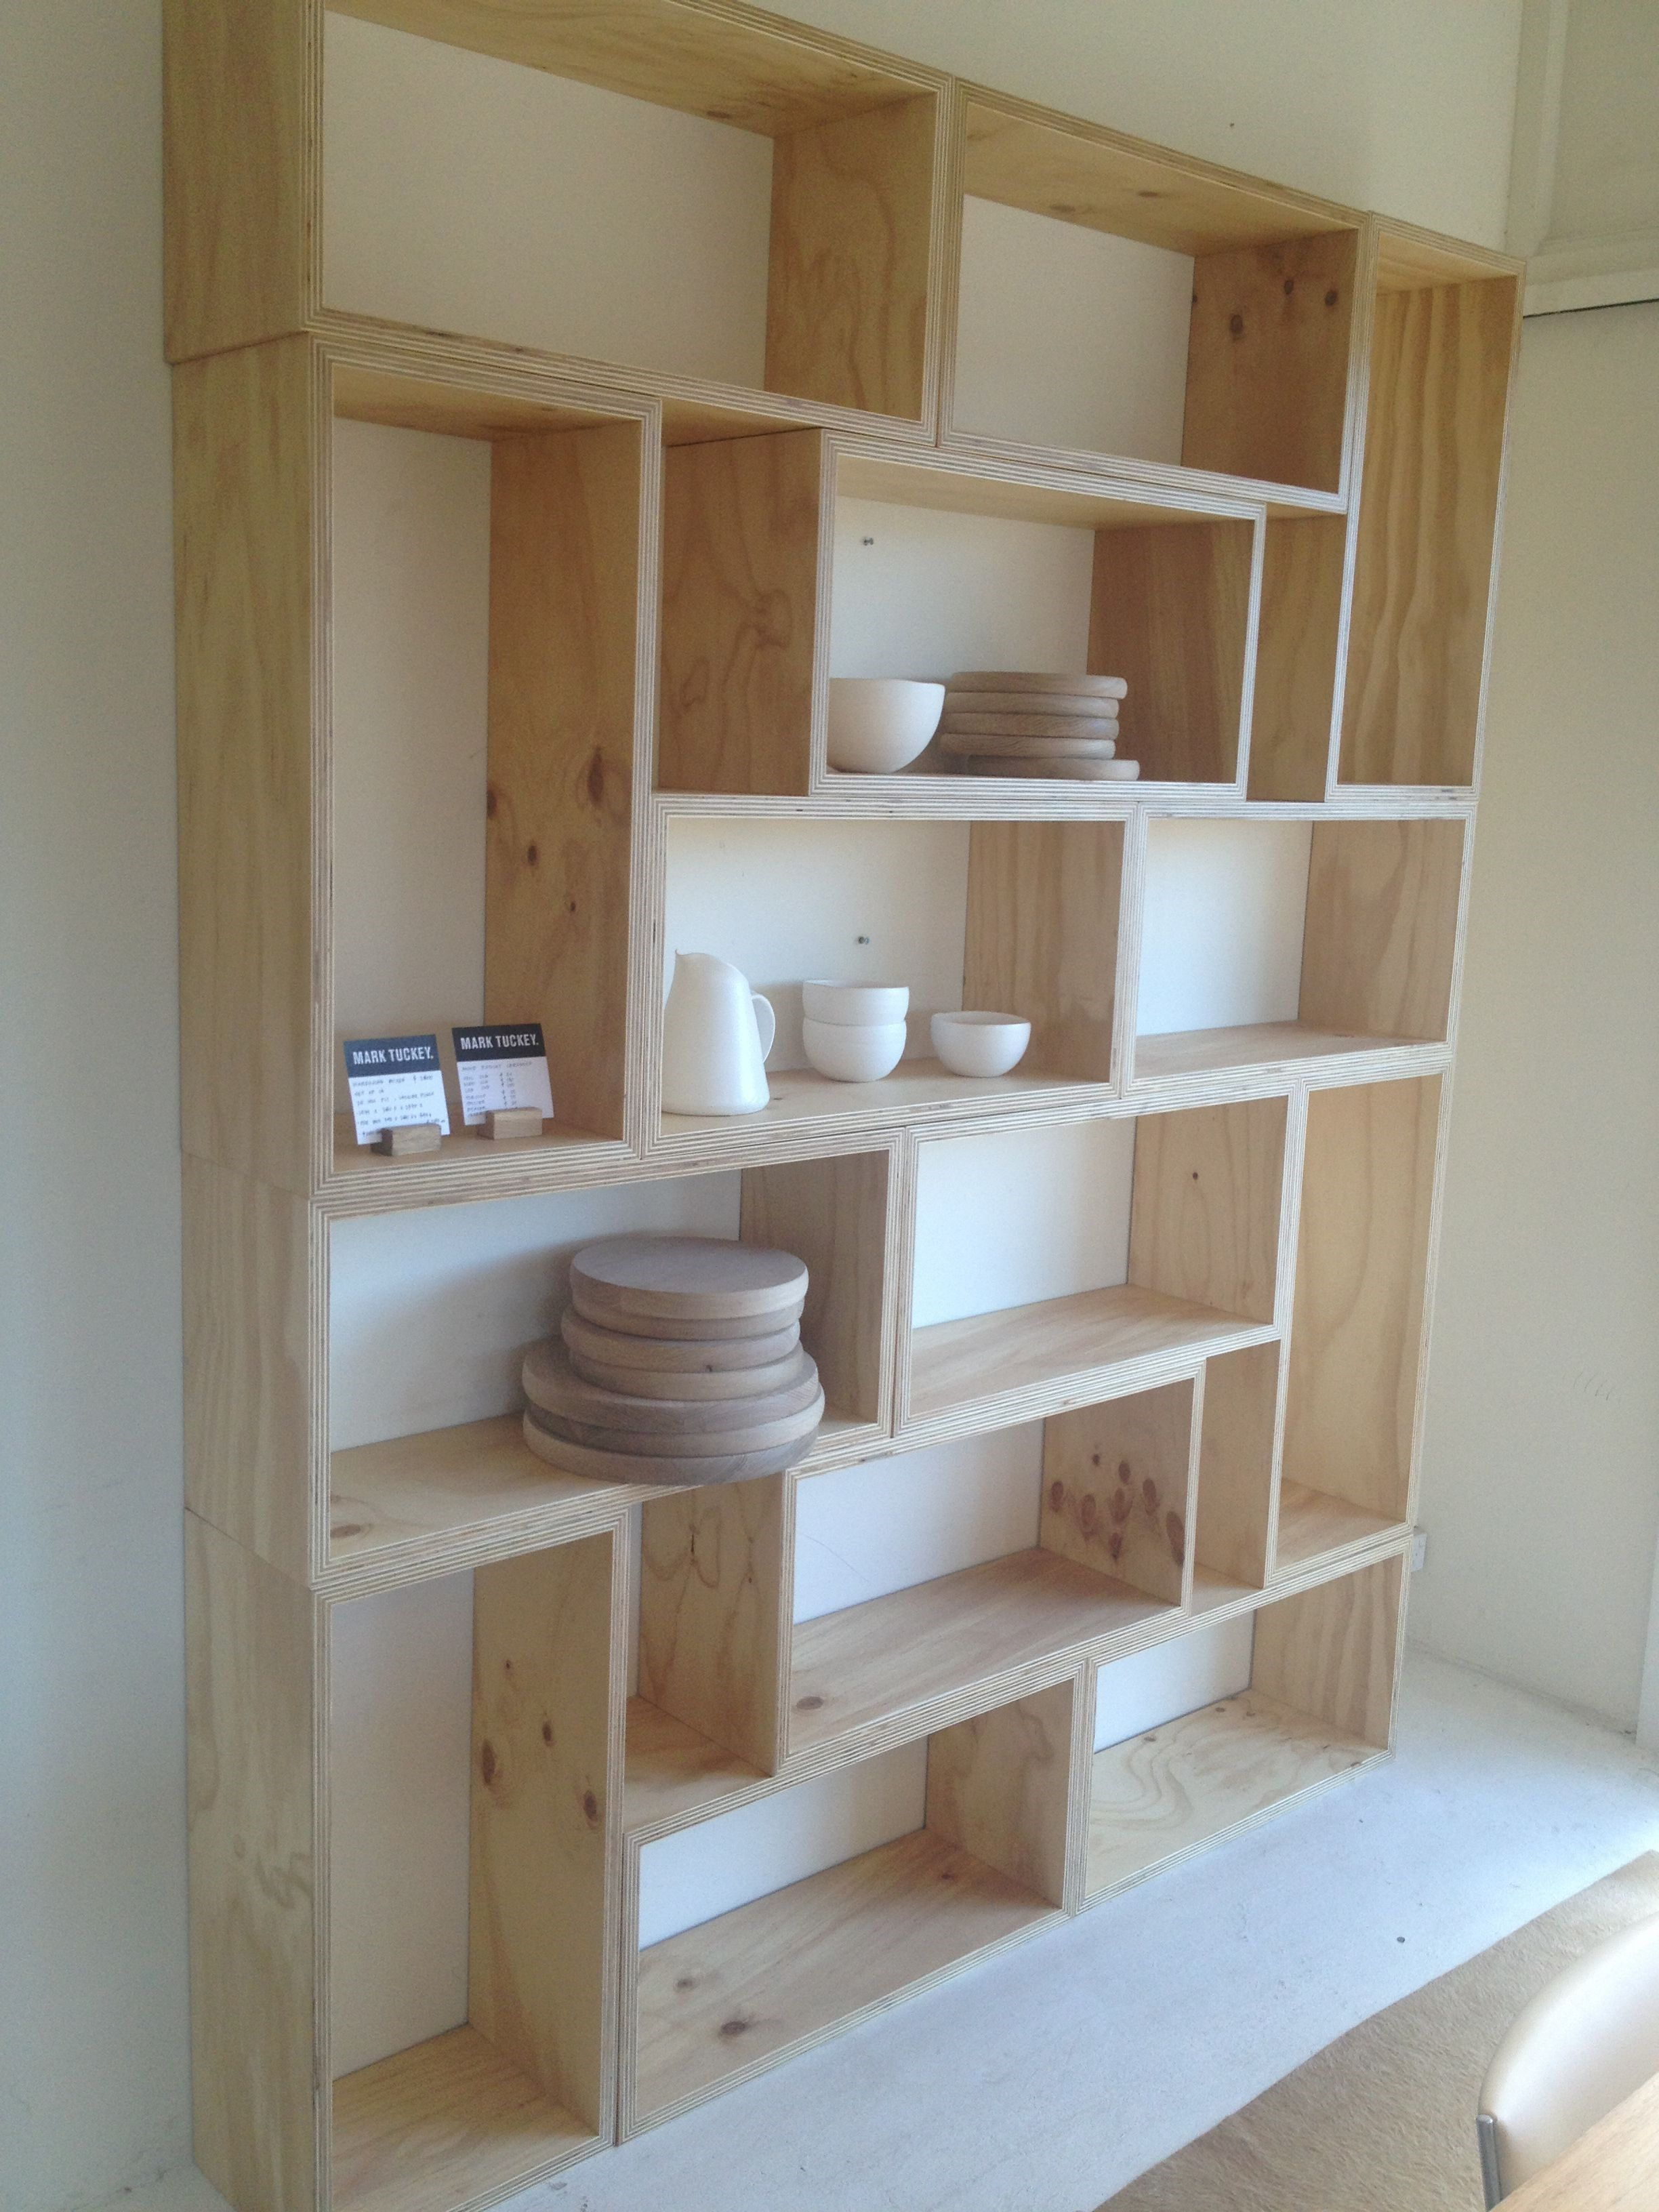 Awesome storage idea storage storageideas diy diy